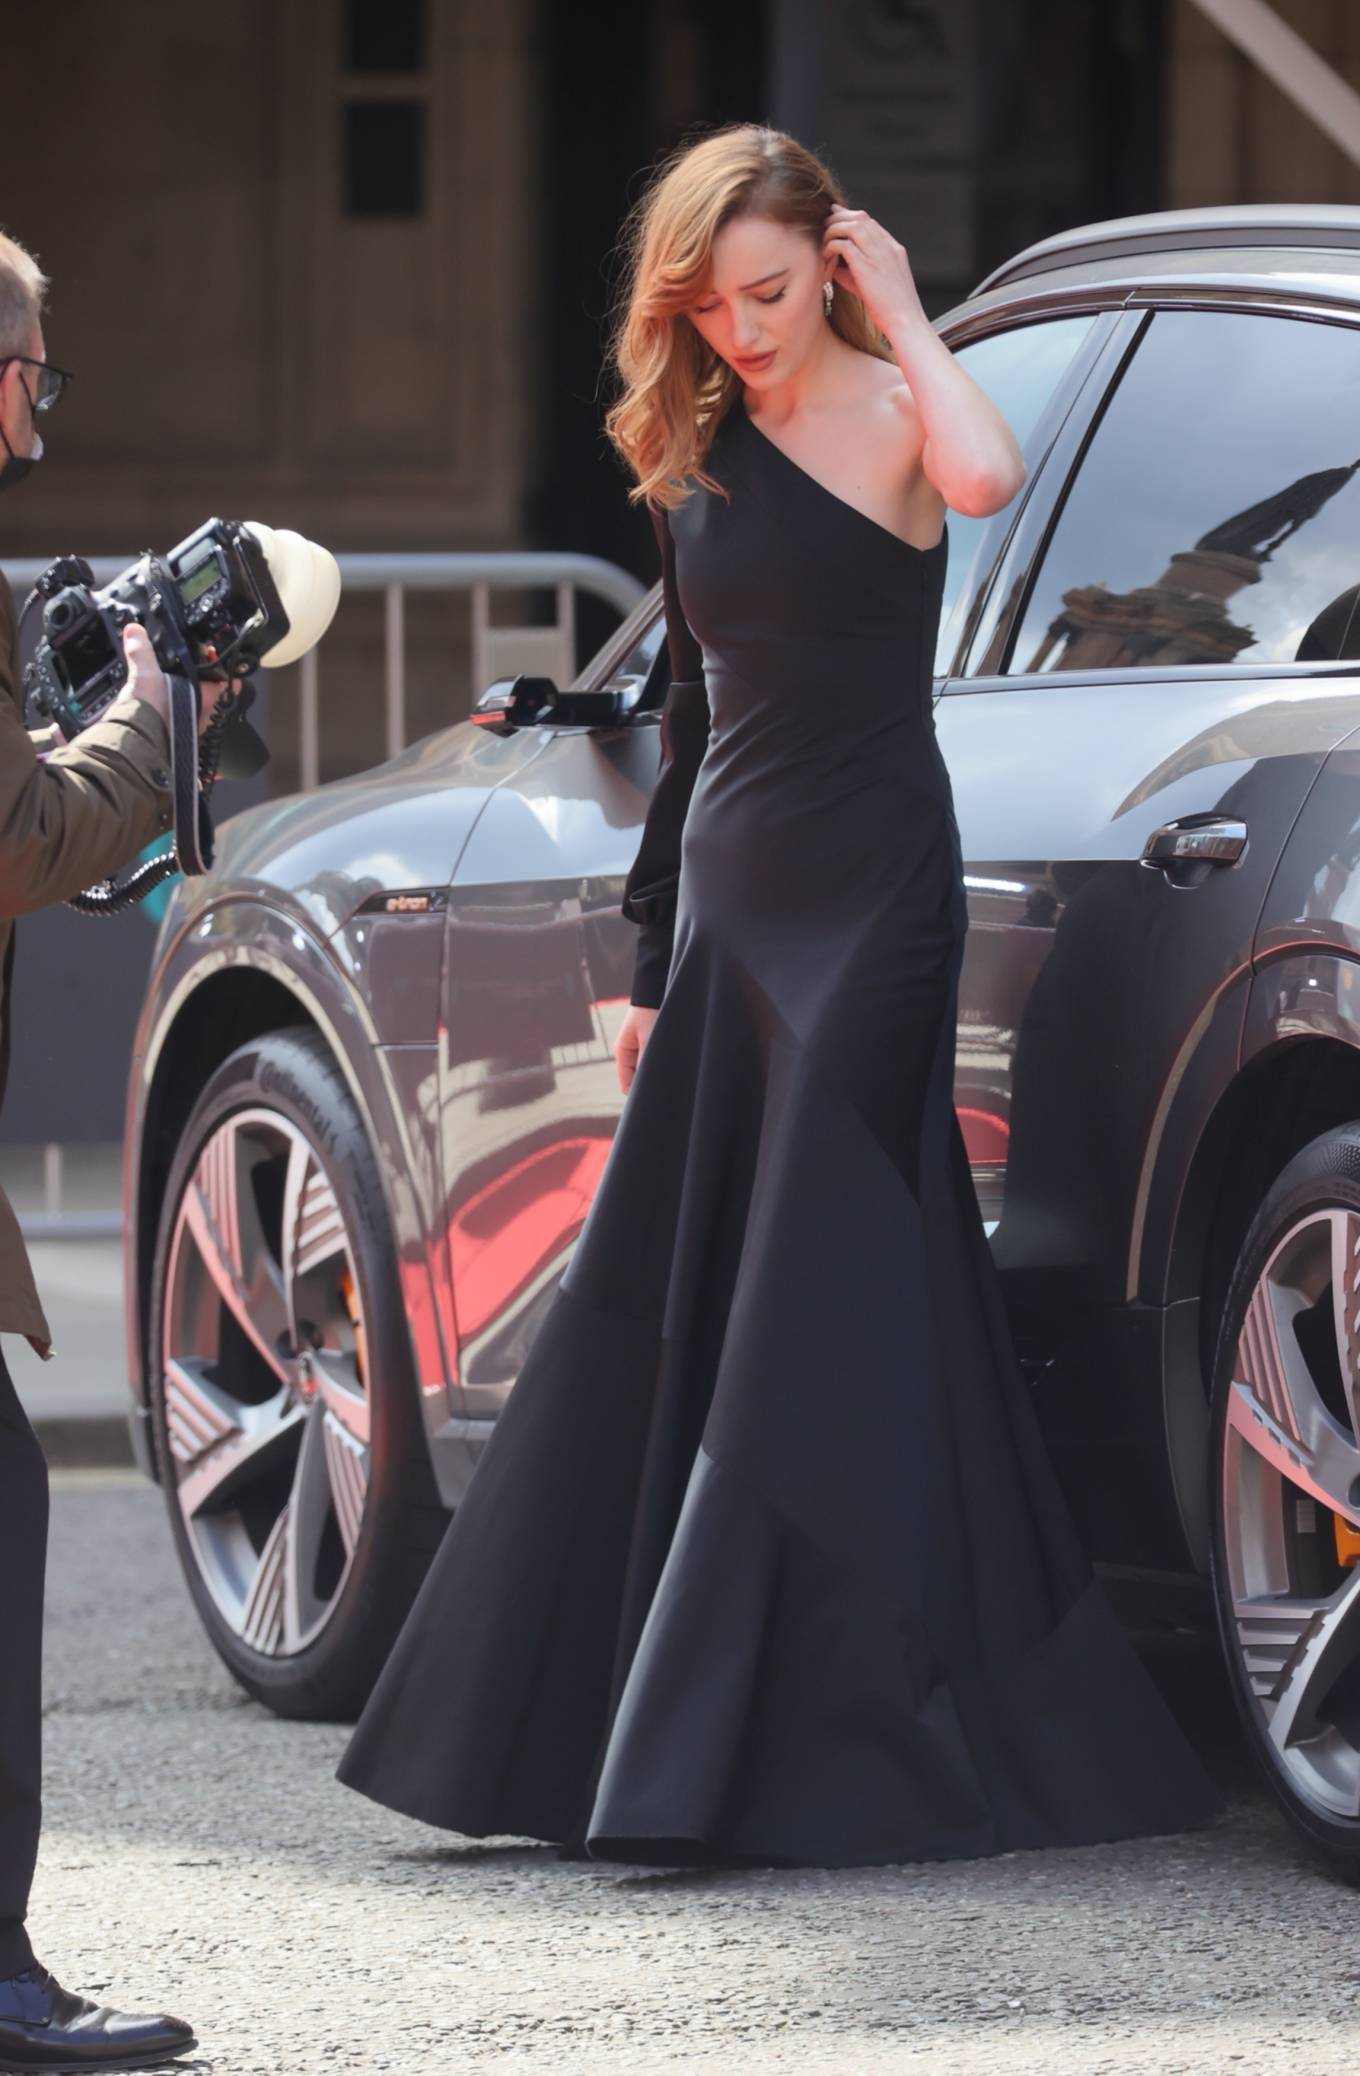 Phoebe Dynevor 2021 : Phoebe Dynevor – at the Royal Albert Hall for 2021 British Academy Film Awards in London-09